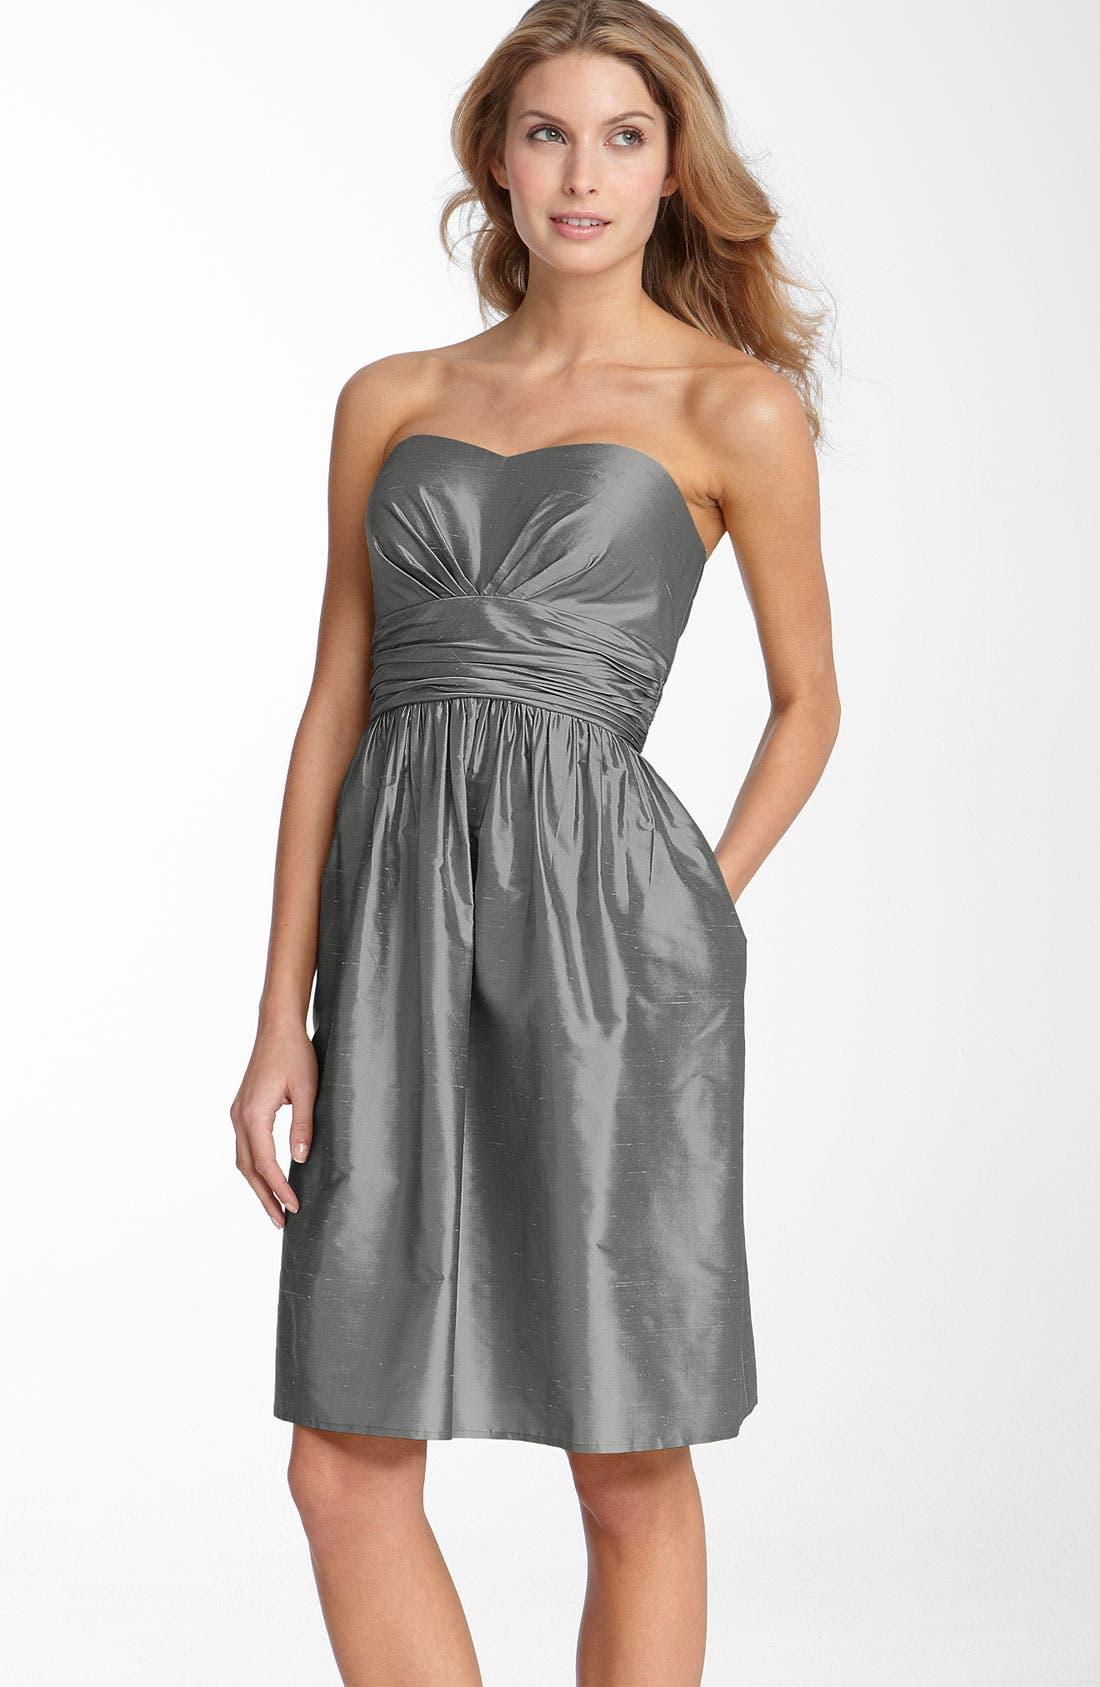 ELIZA J Silk Shantung Dress, Main, color, 010